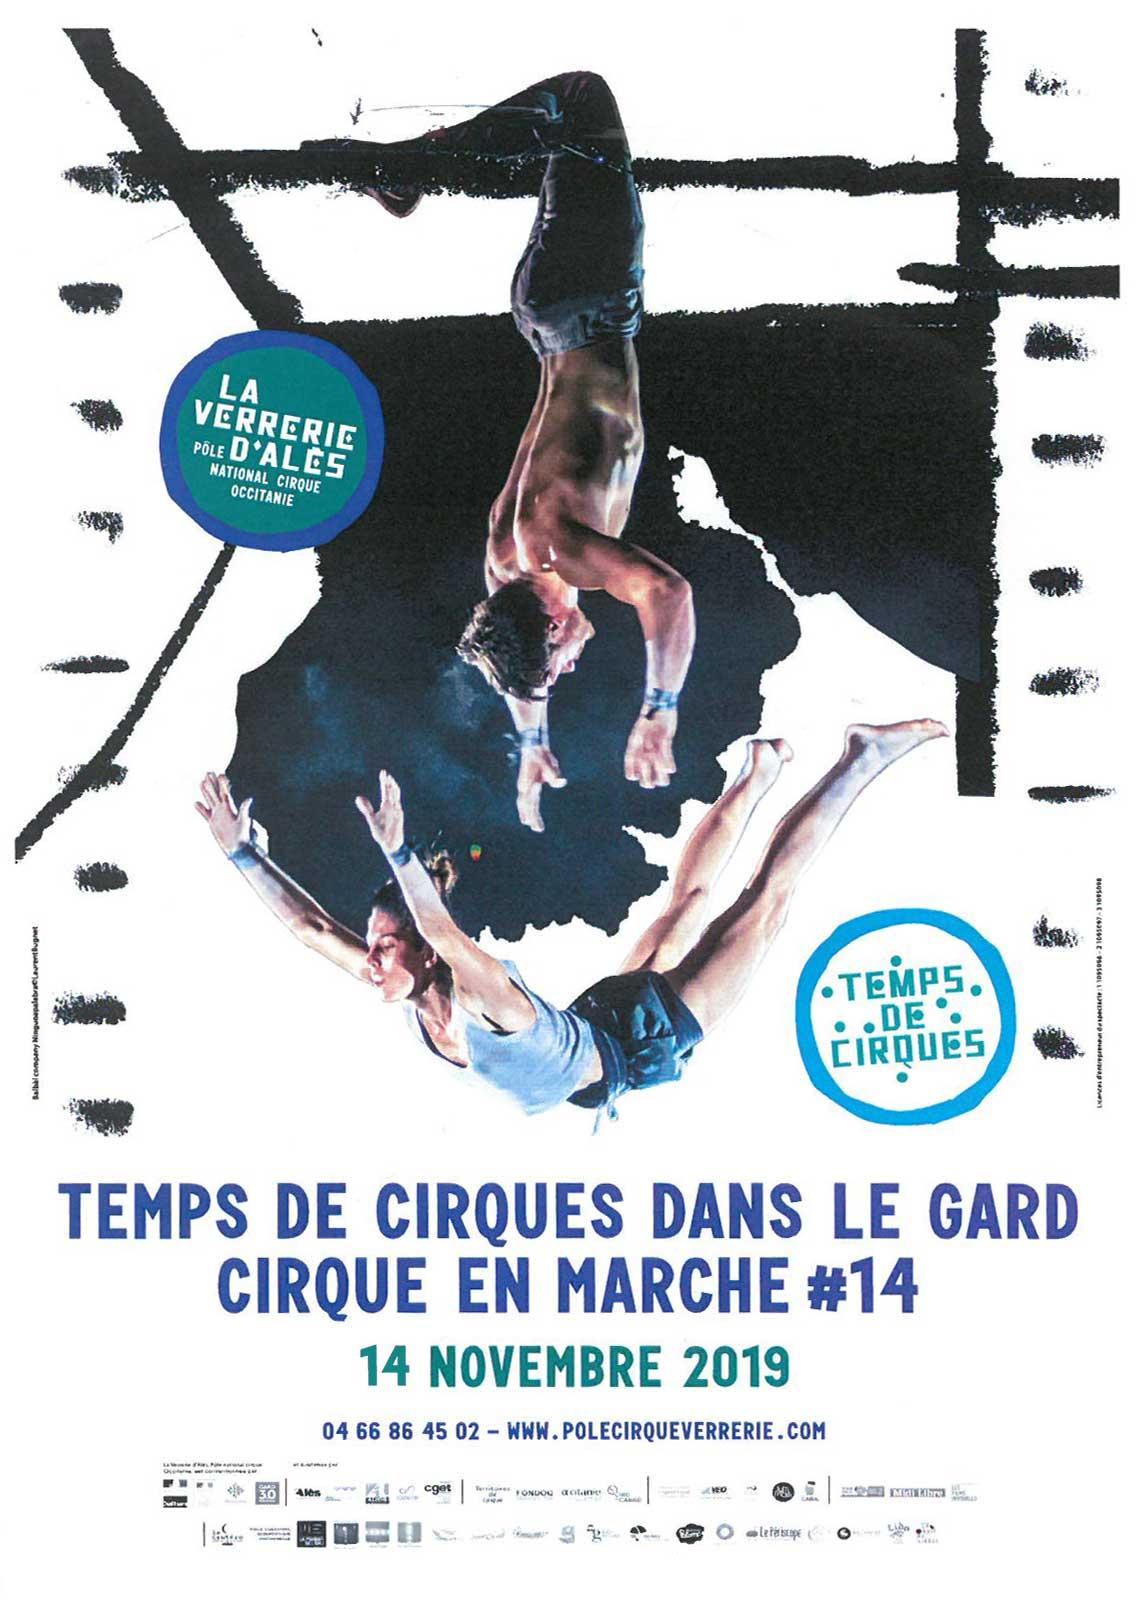 temps_de_cirques_dans_le_gard-01